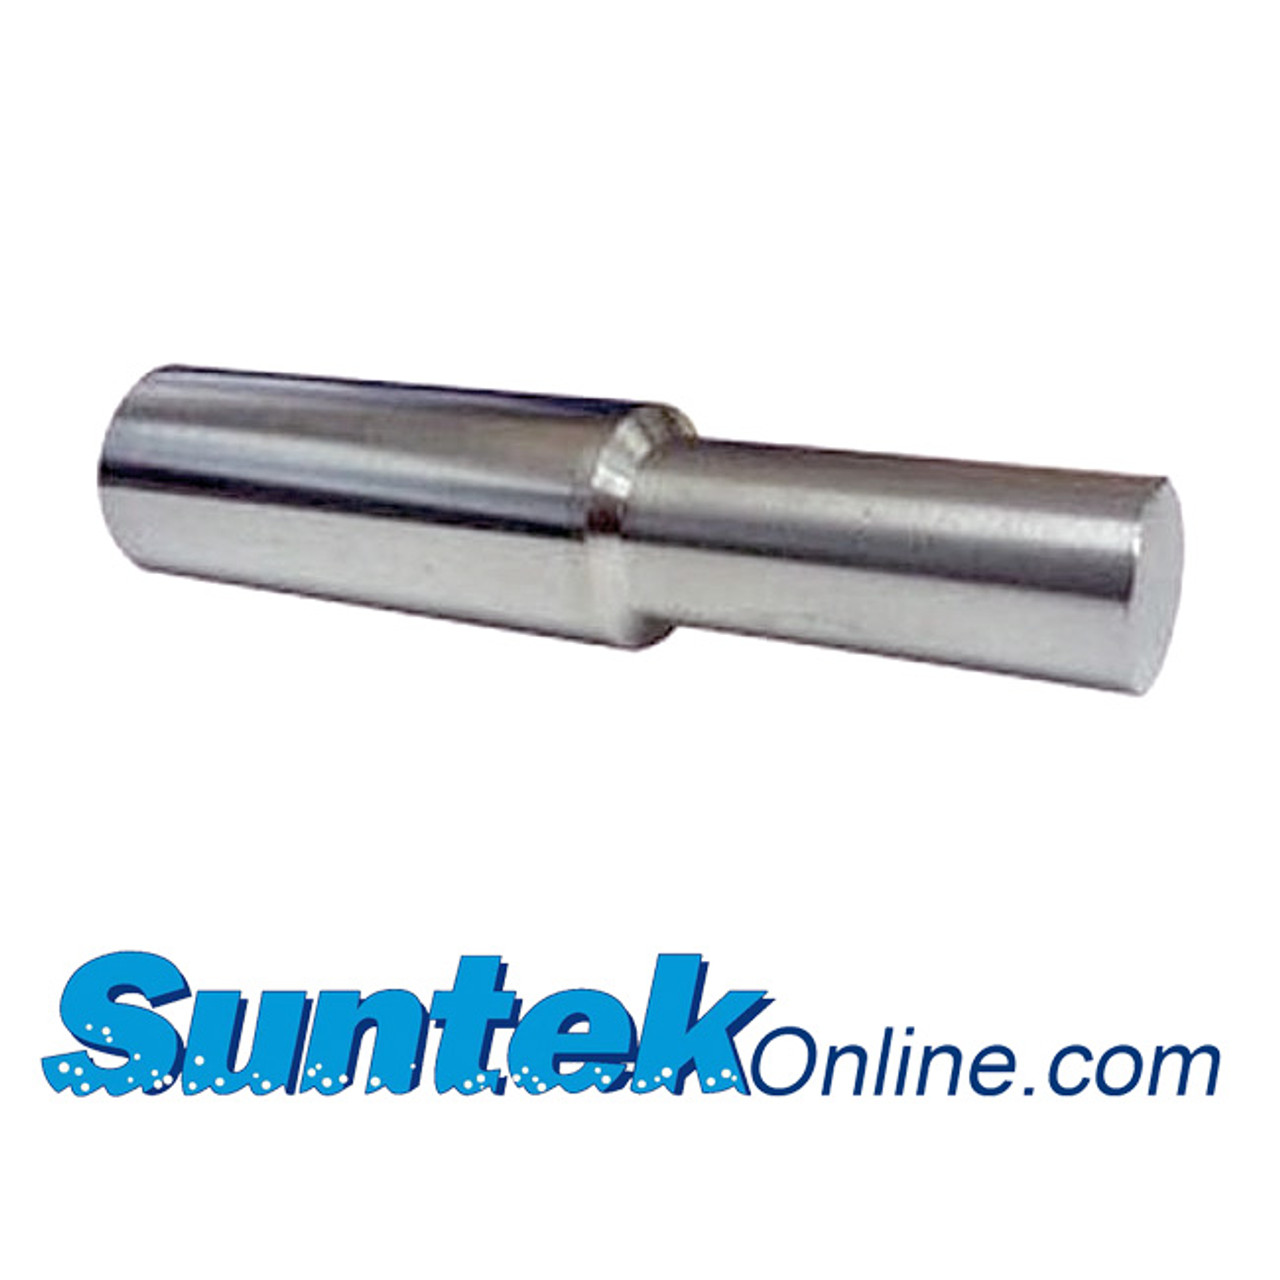 Loop Loc Aluminum Tamp Tool For Installing Brass Anchors